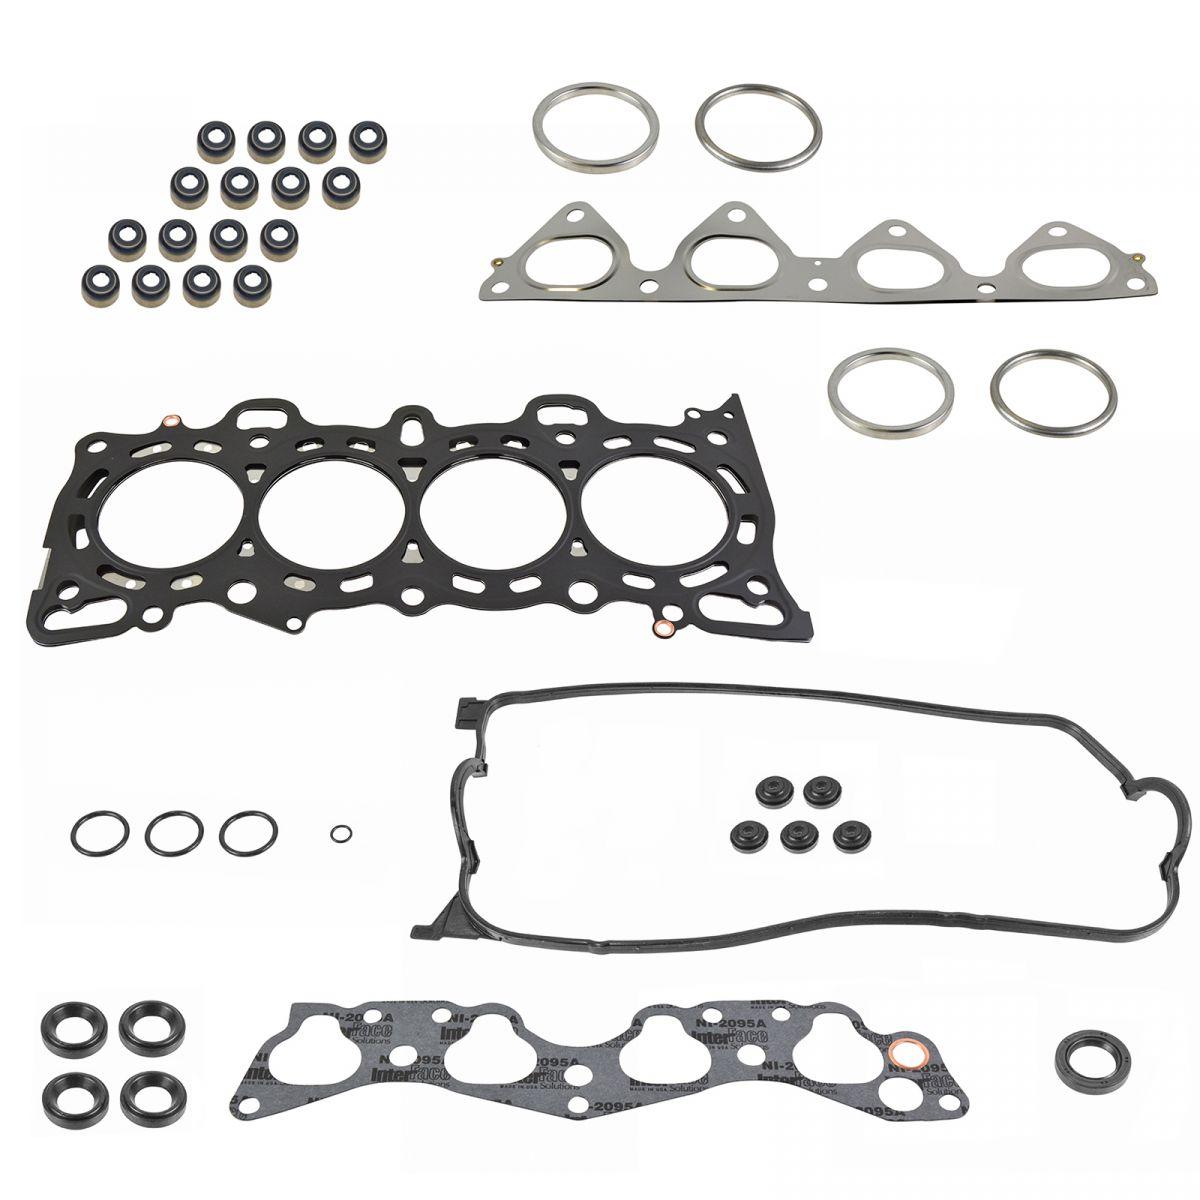 Head Gasket Set Kit For Honda Civic Acura EL 1.6L D16Y5 D16Y7 D16Y8 Engines